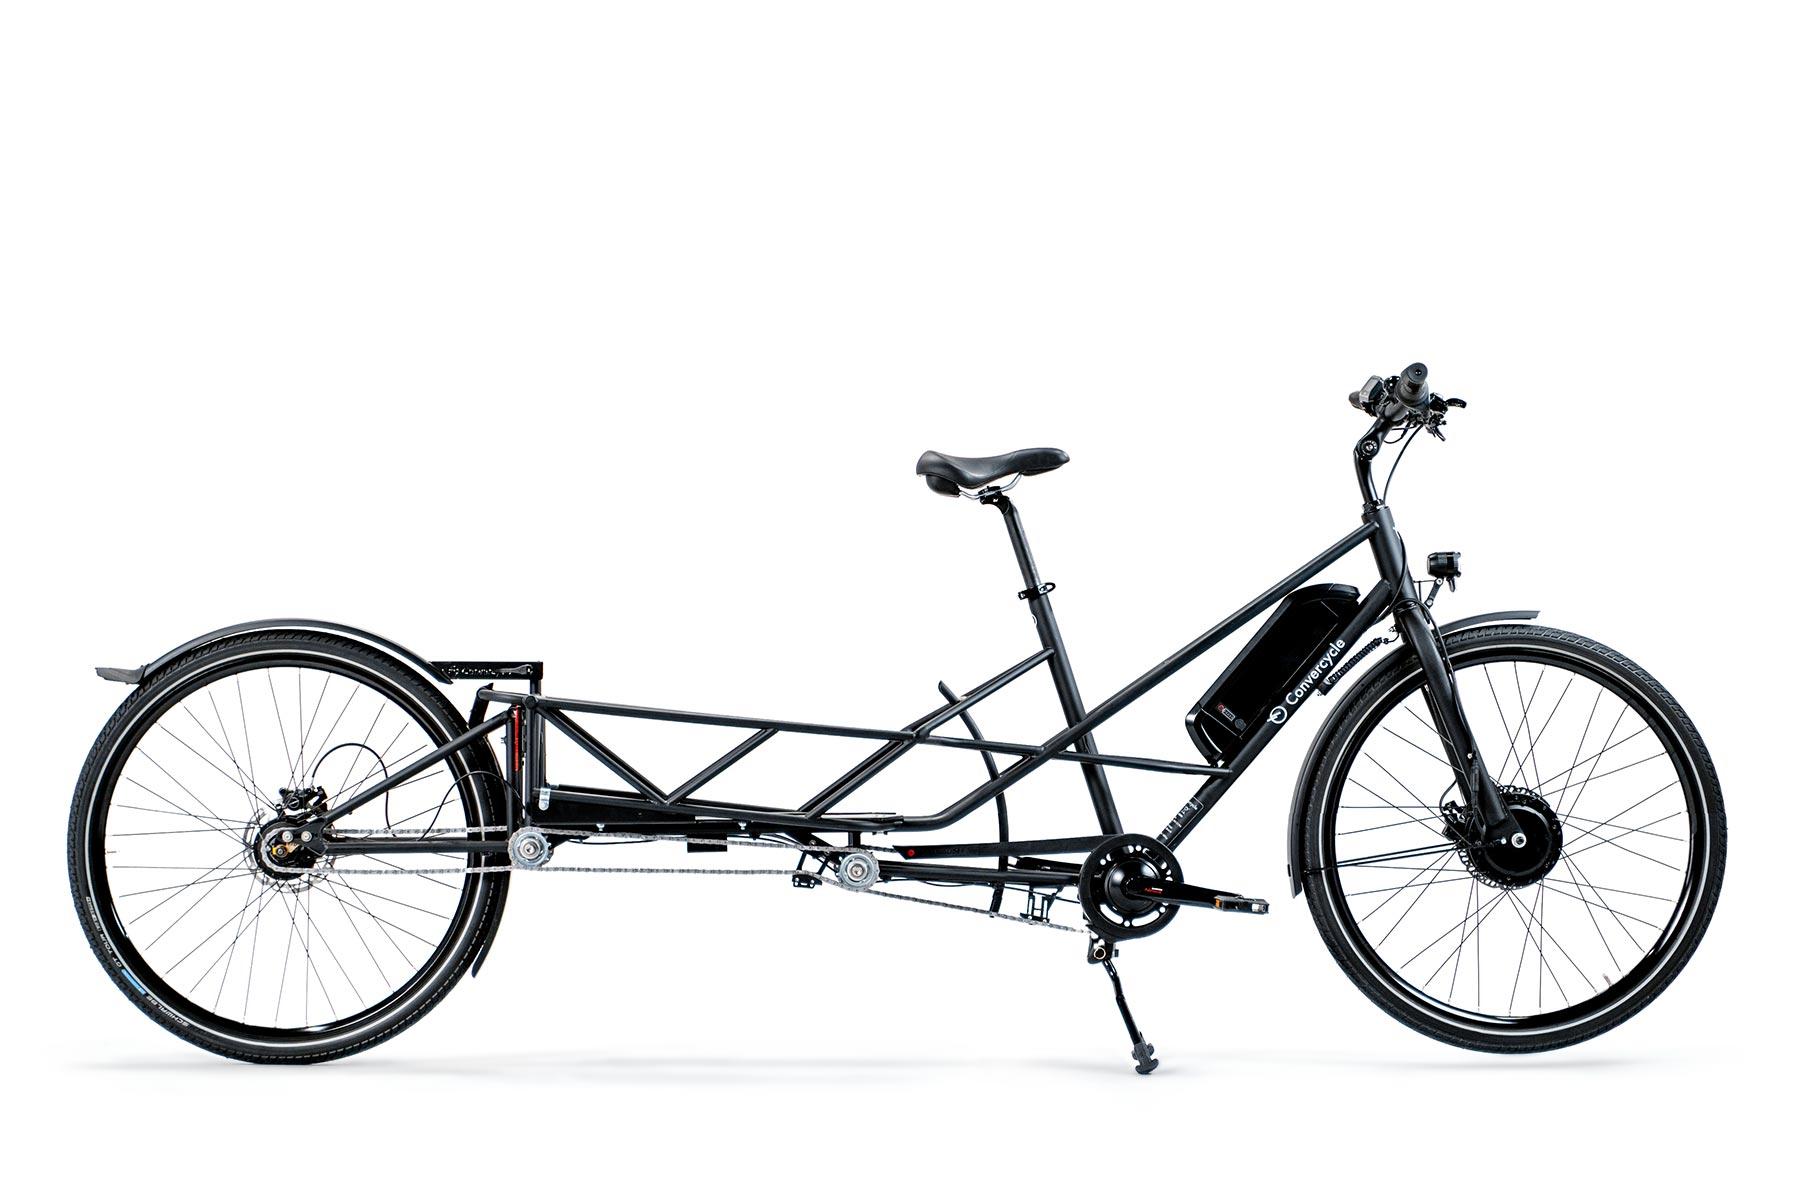 Convercycle Bike als E-Cargo - eBikeNews